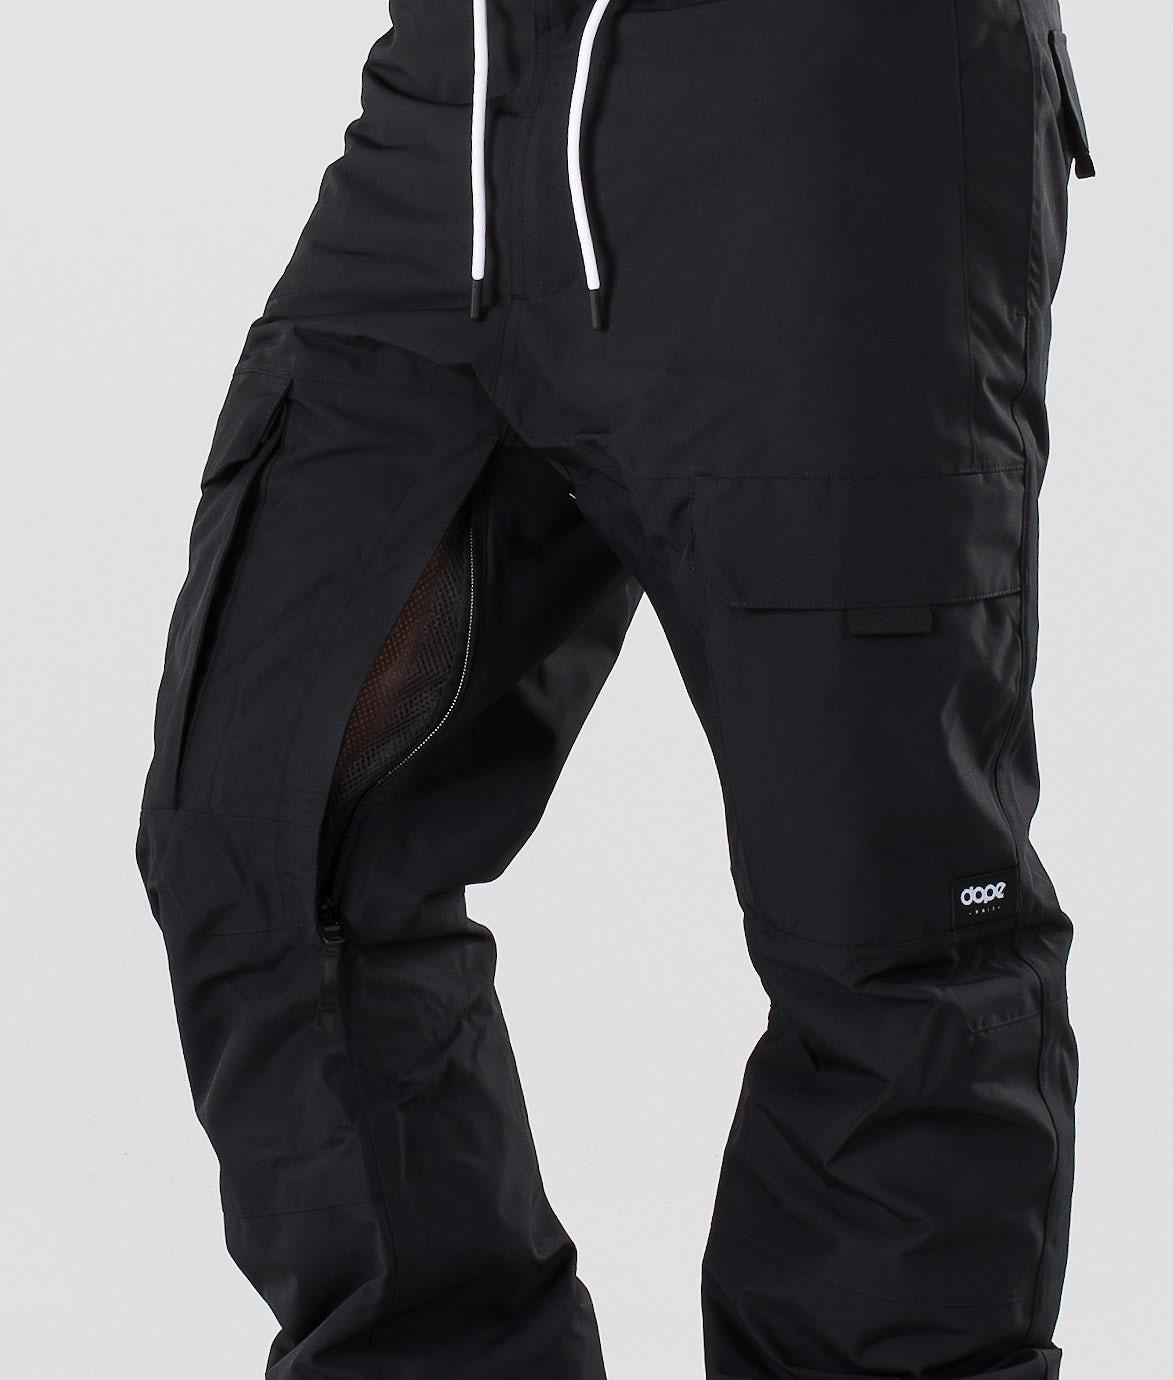 Dope Poise Snowboardbukse Black